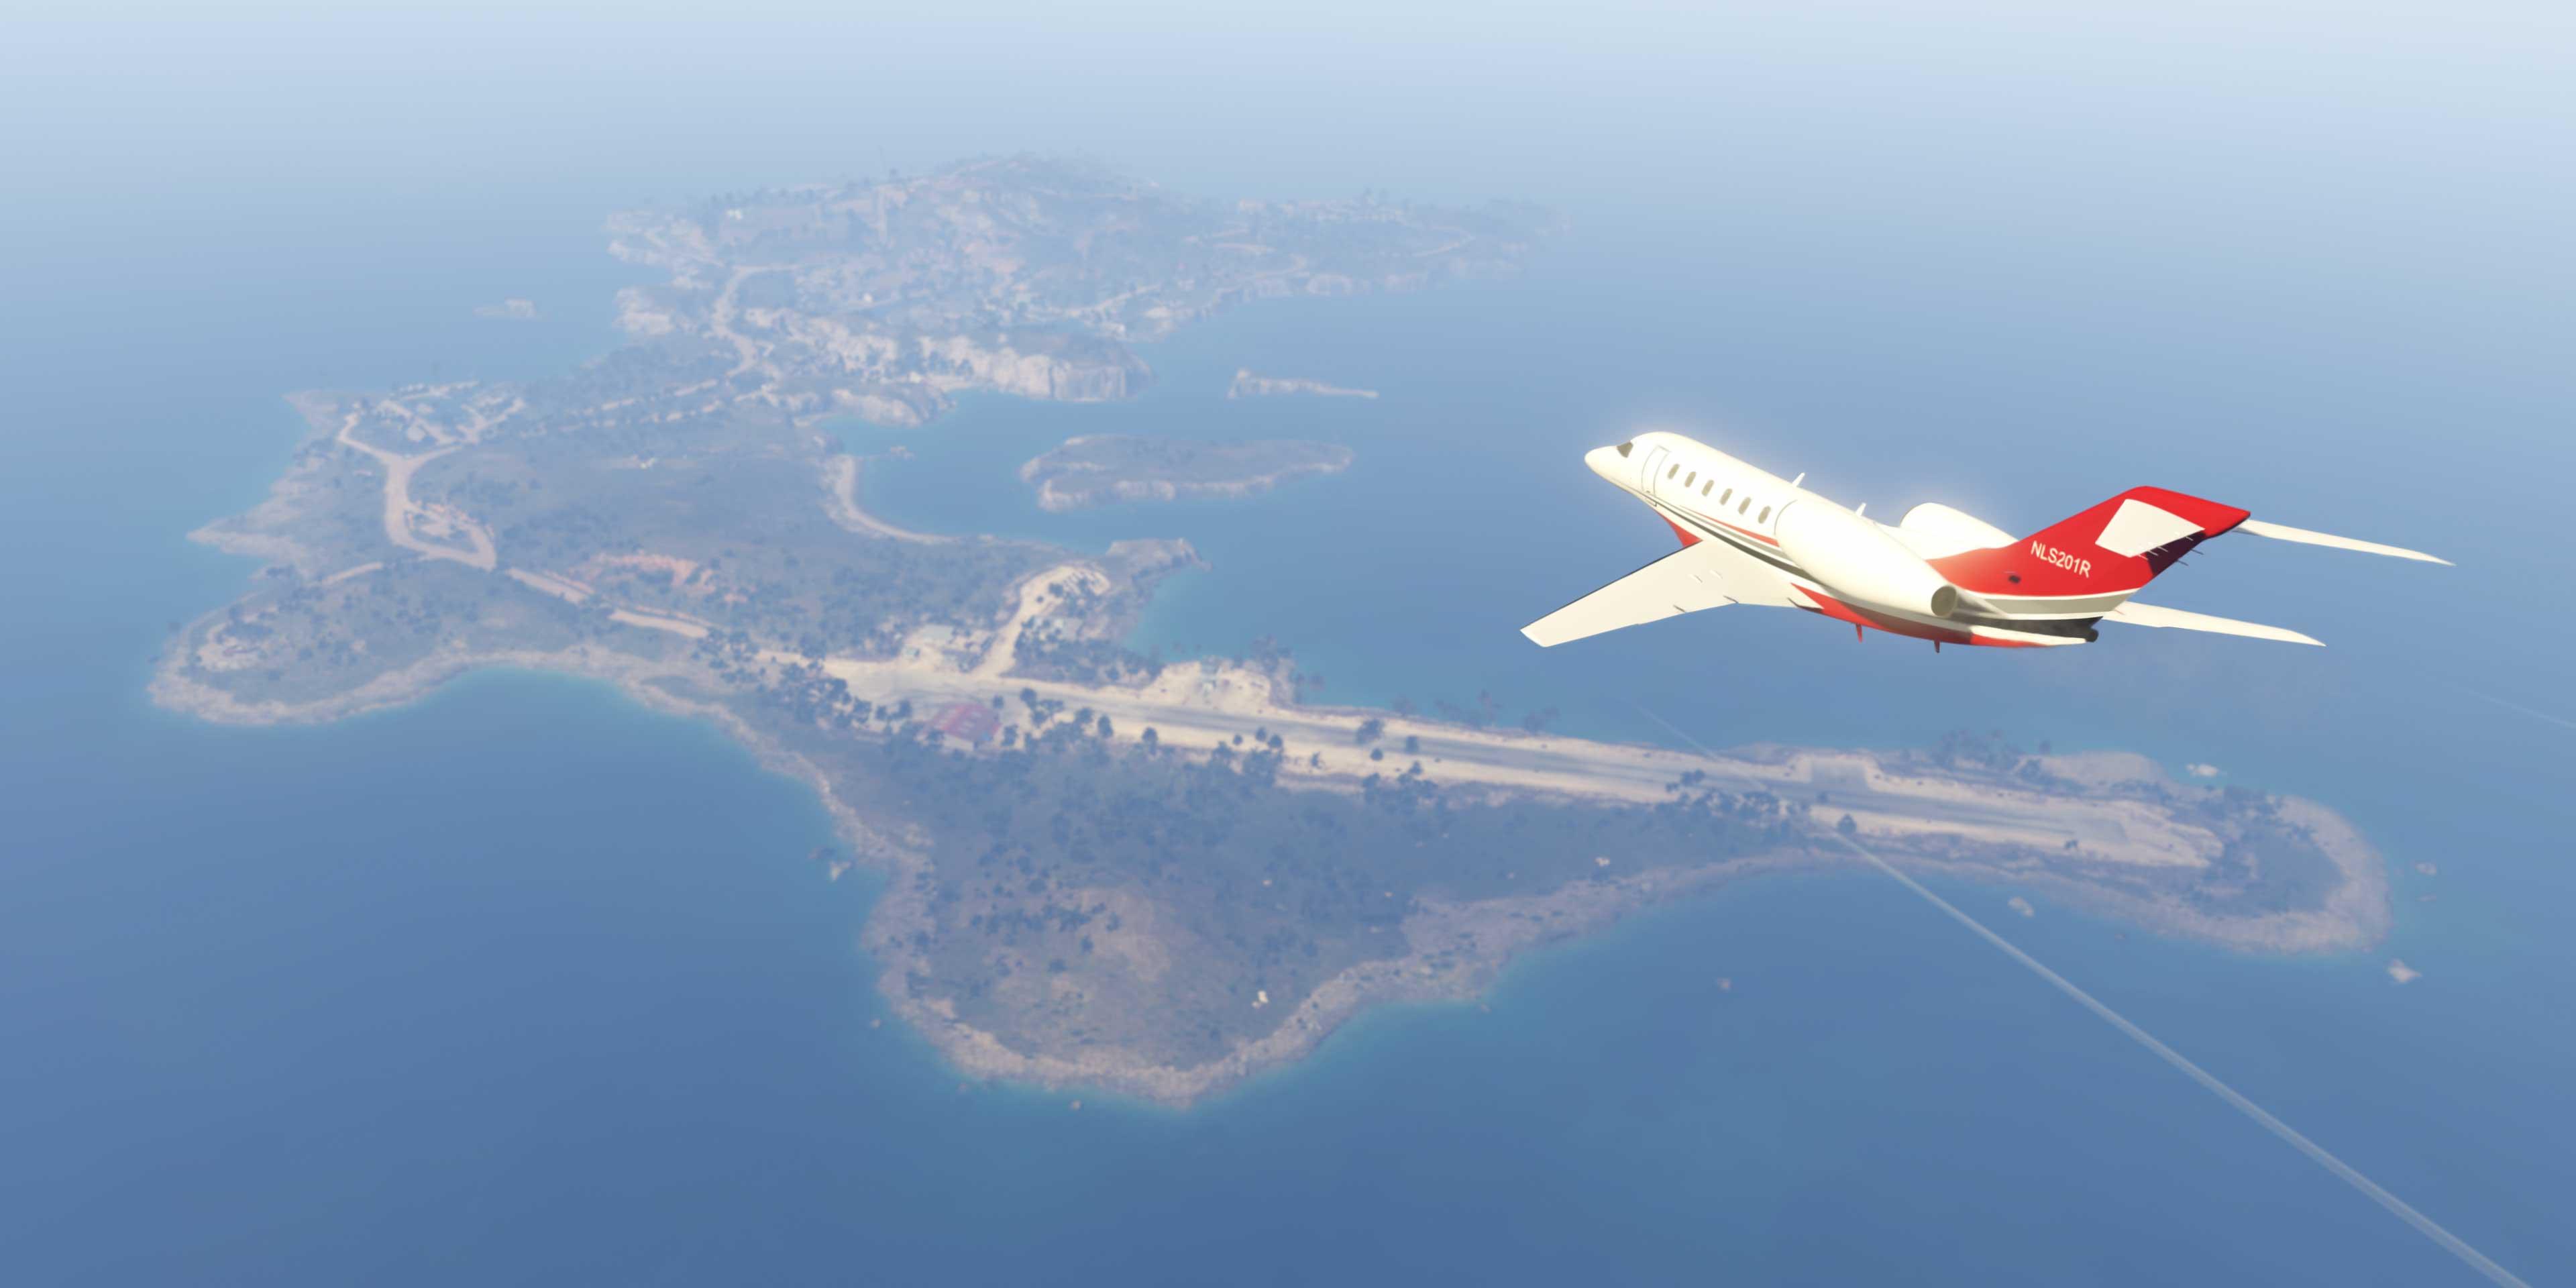 《GTAOL》佩里科岛抢劫任务现已推出 一起发掘海上财富